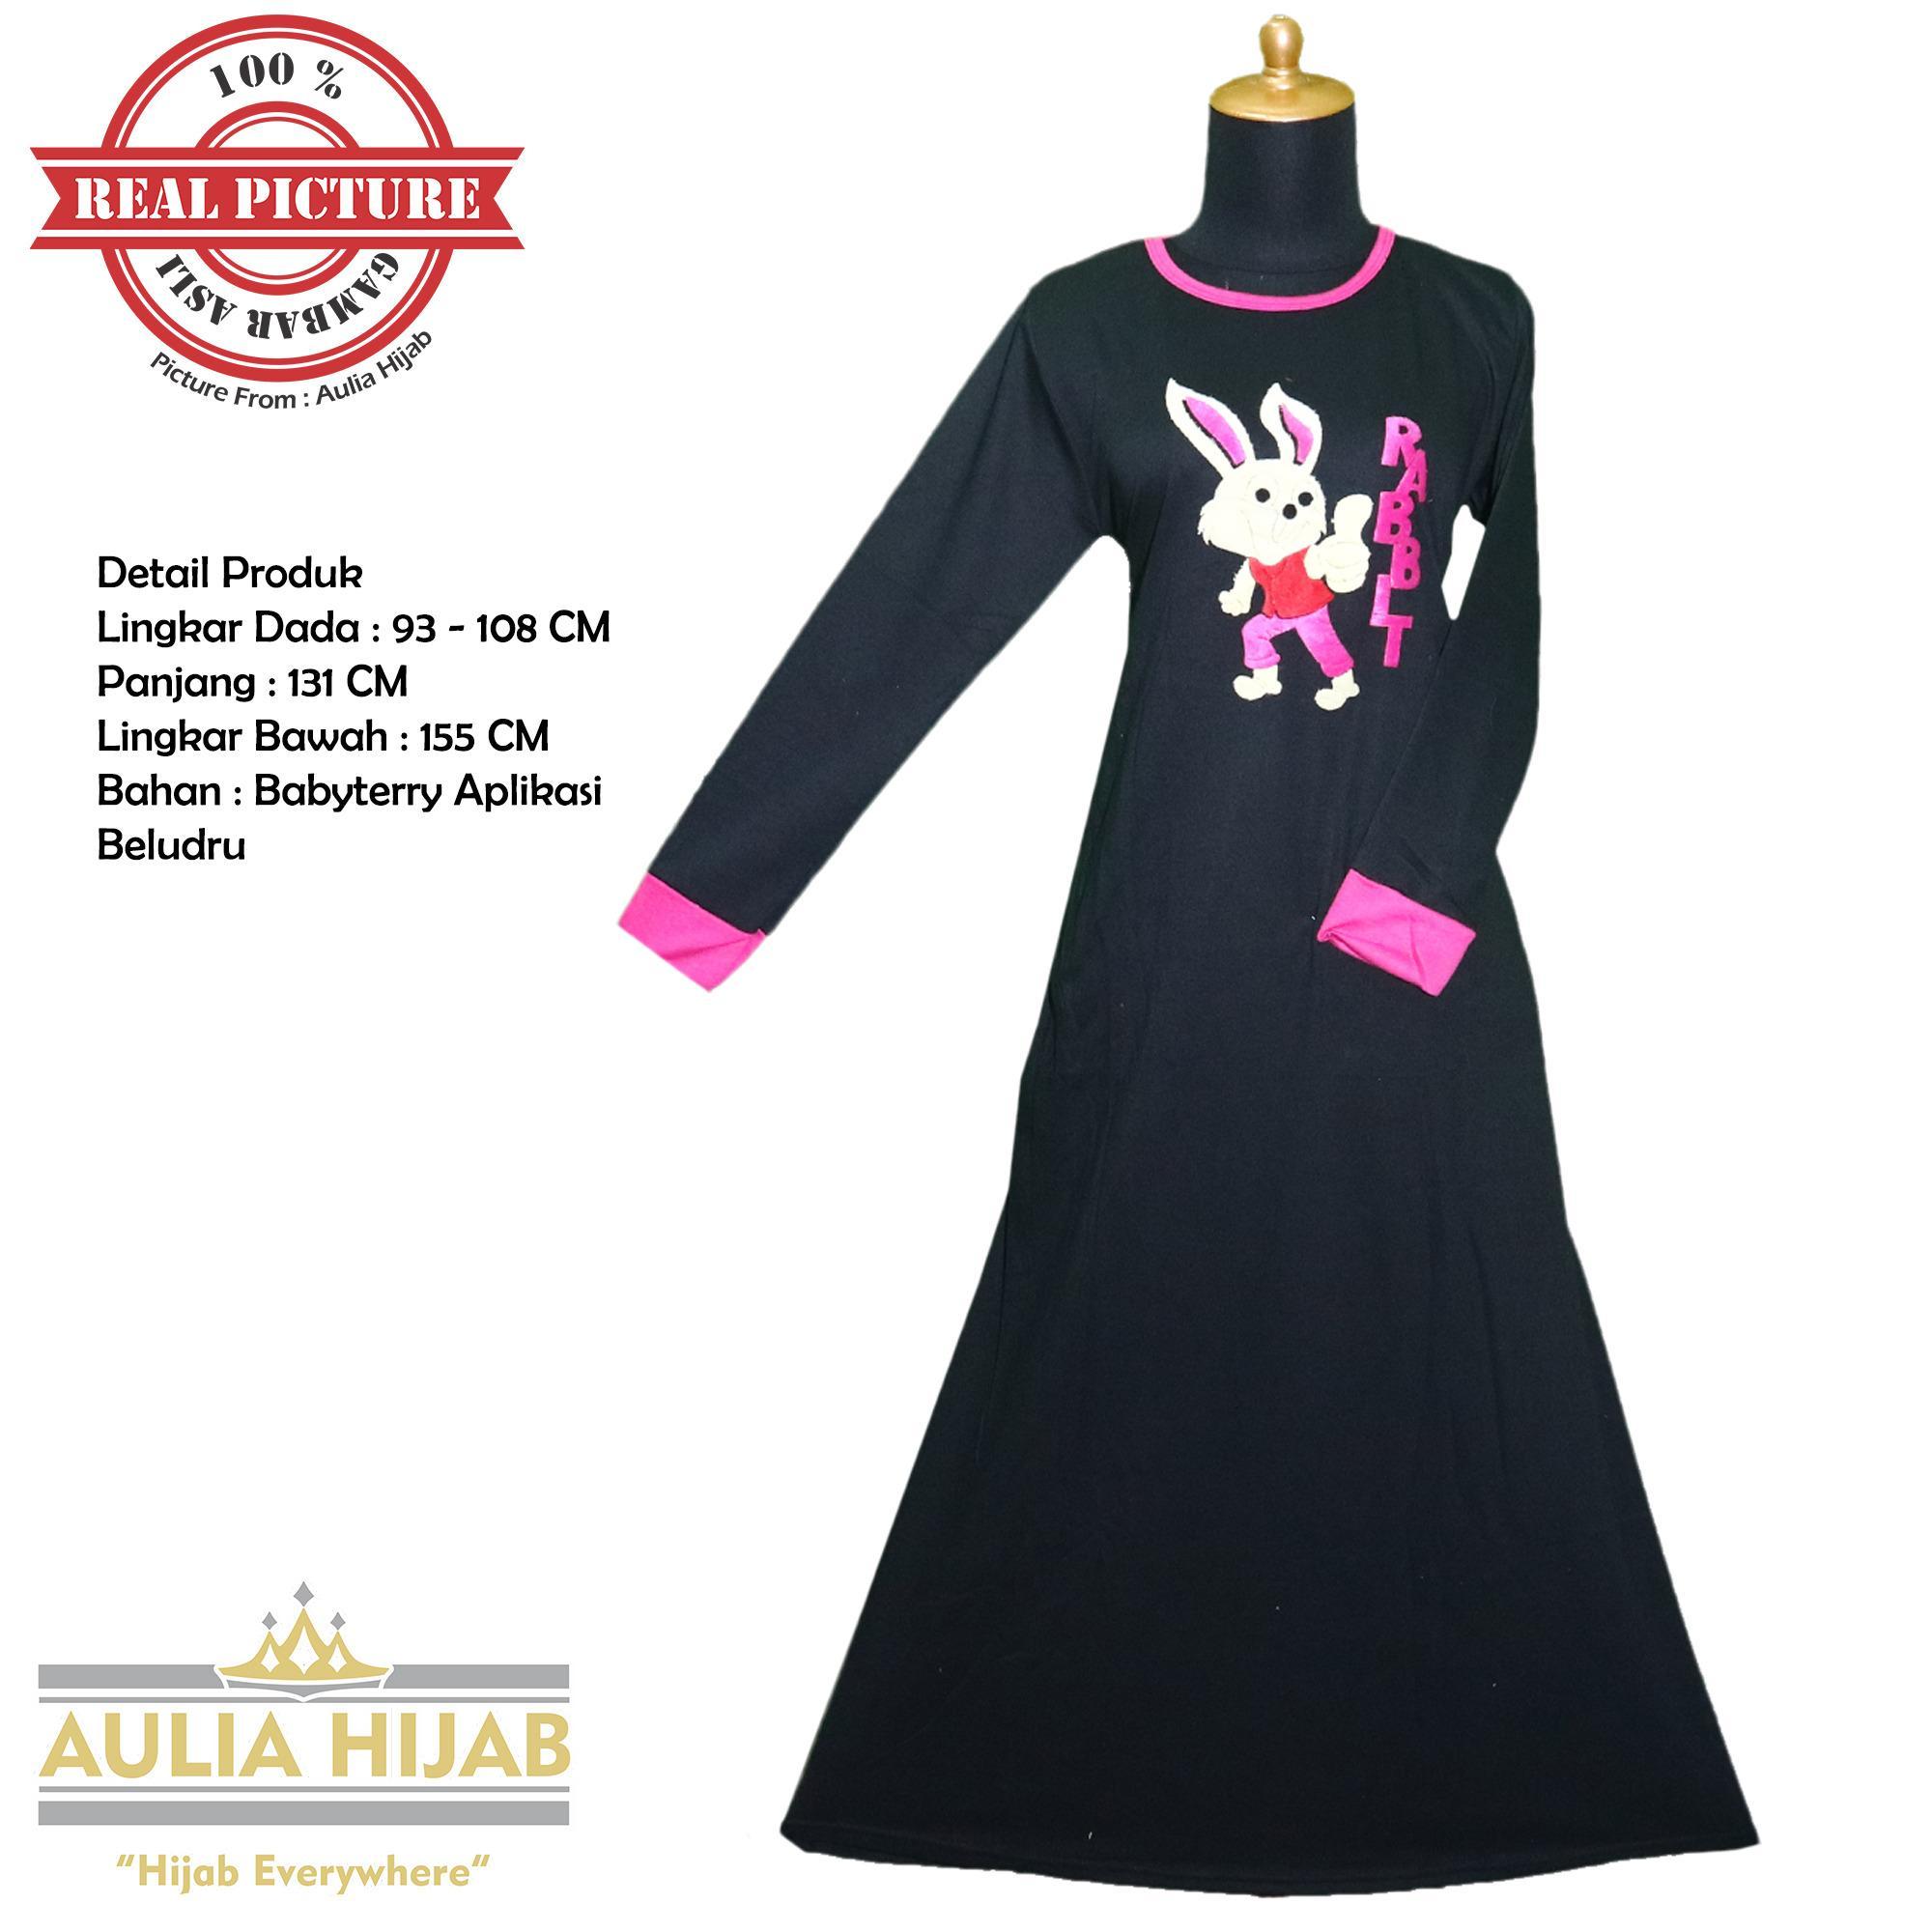 Promo Aulia Hijab Rabbit Dress Gamis Waffle Gamis Busui Gamis Beludru Gamis Best Seller Gamis Terbaru Gamis Babyterry Gamis Kondangan Gamis Santai Gamis Murah Gamis Busui Gamis Cantik Gamis Polos Gamis Pesta Gamis Real Picture Riau